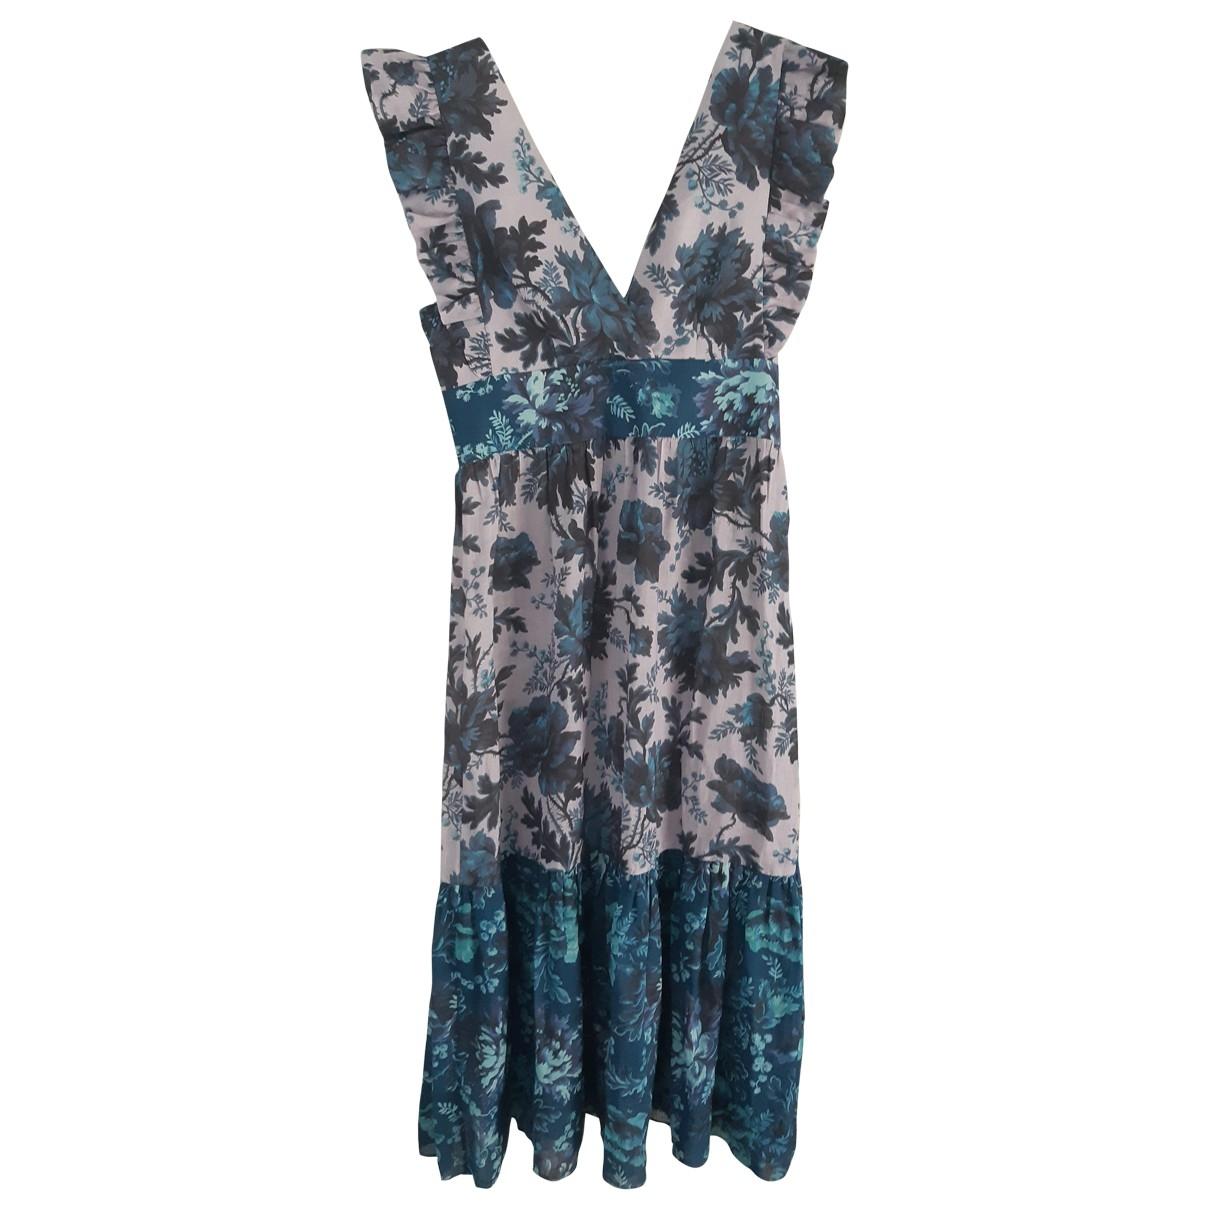 House Of Hackney \N Multicolour Cotton dress for Women 38 IT